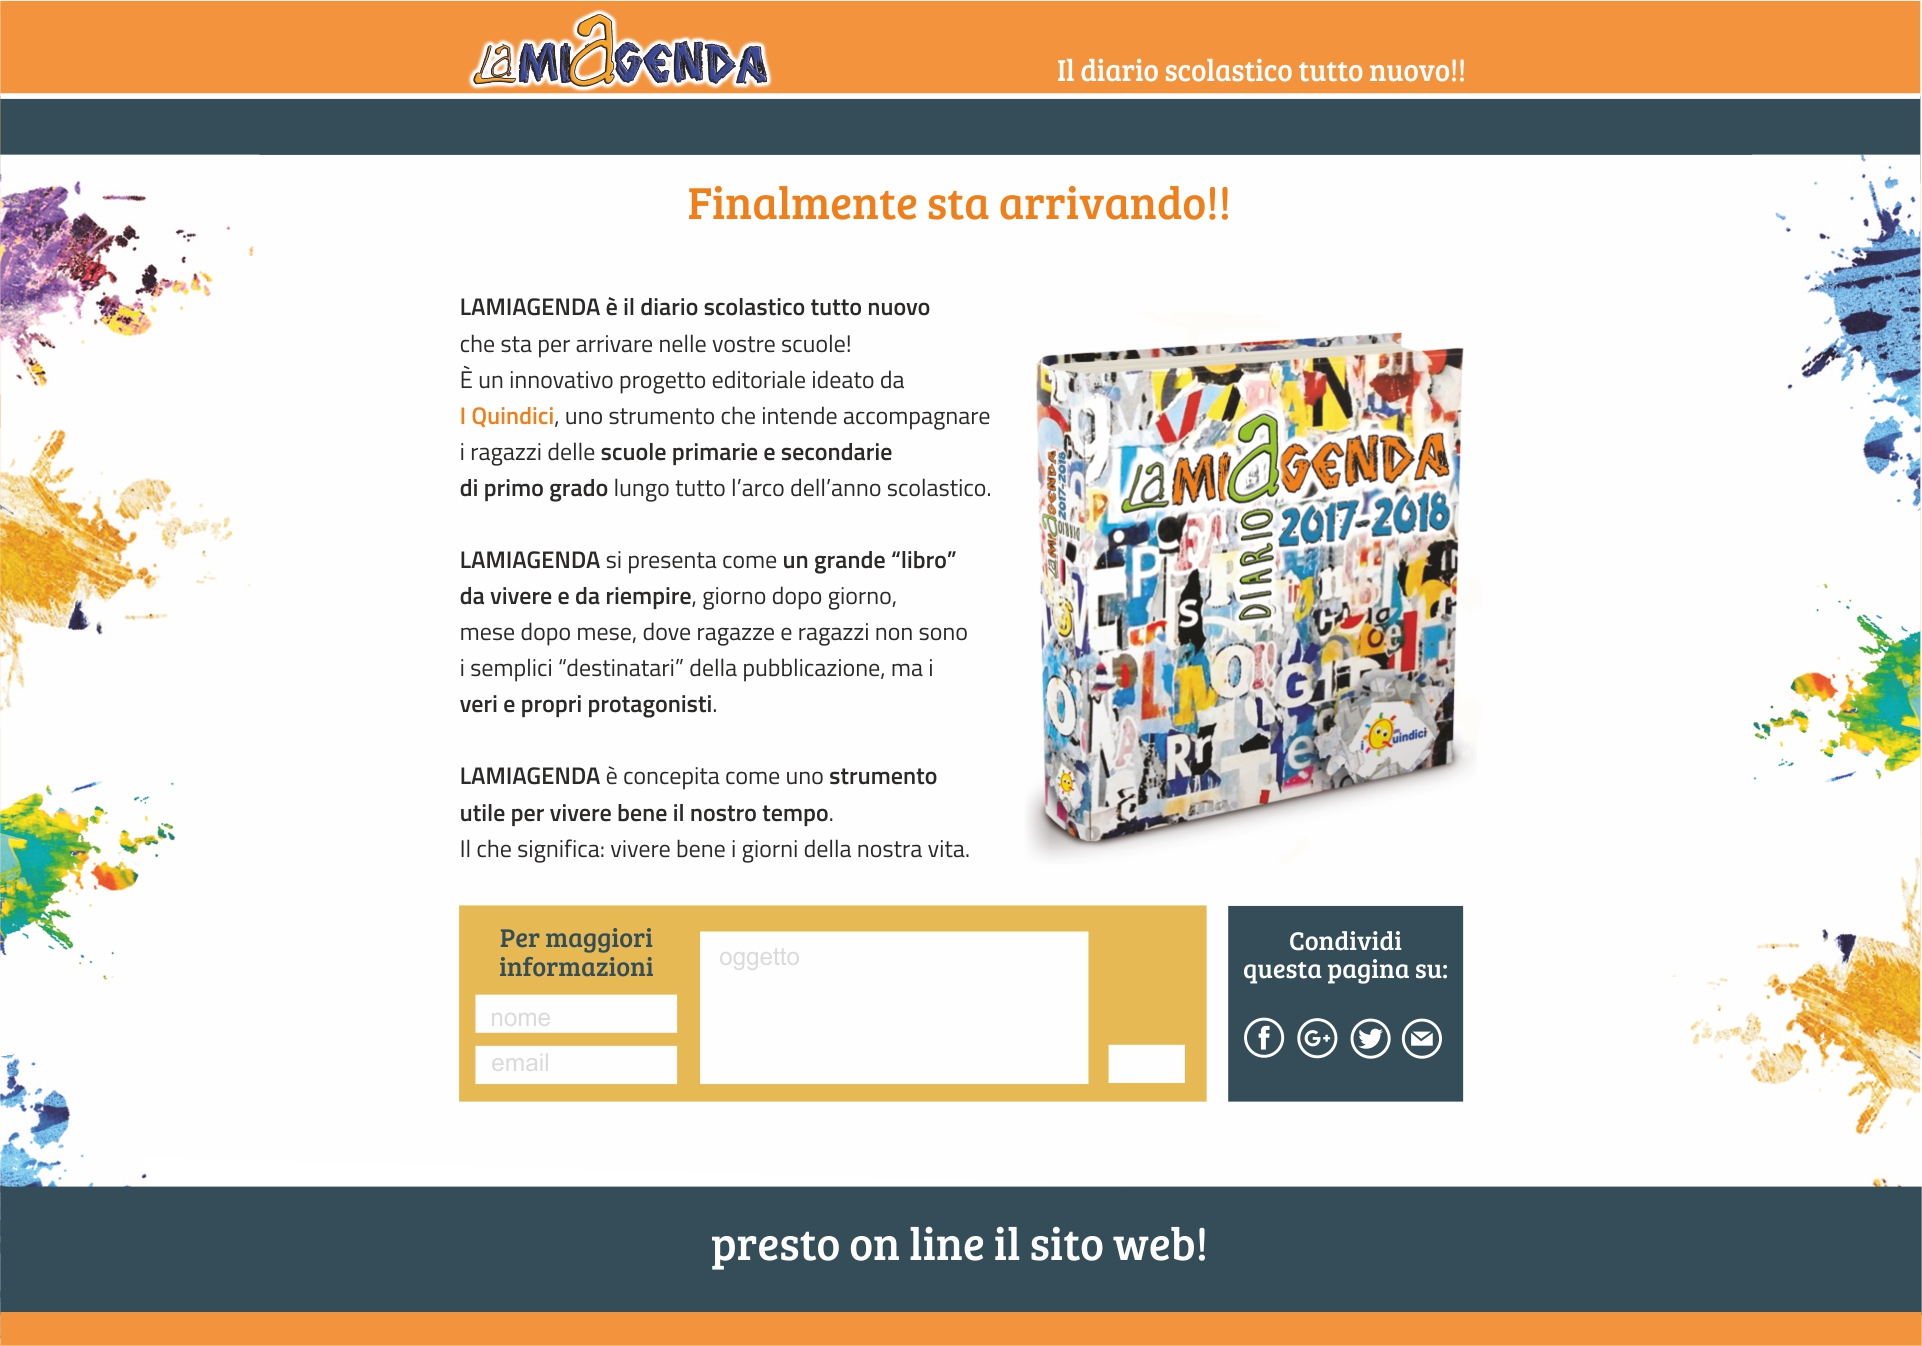 sito-web-pagprovvisoria